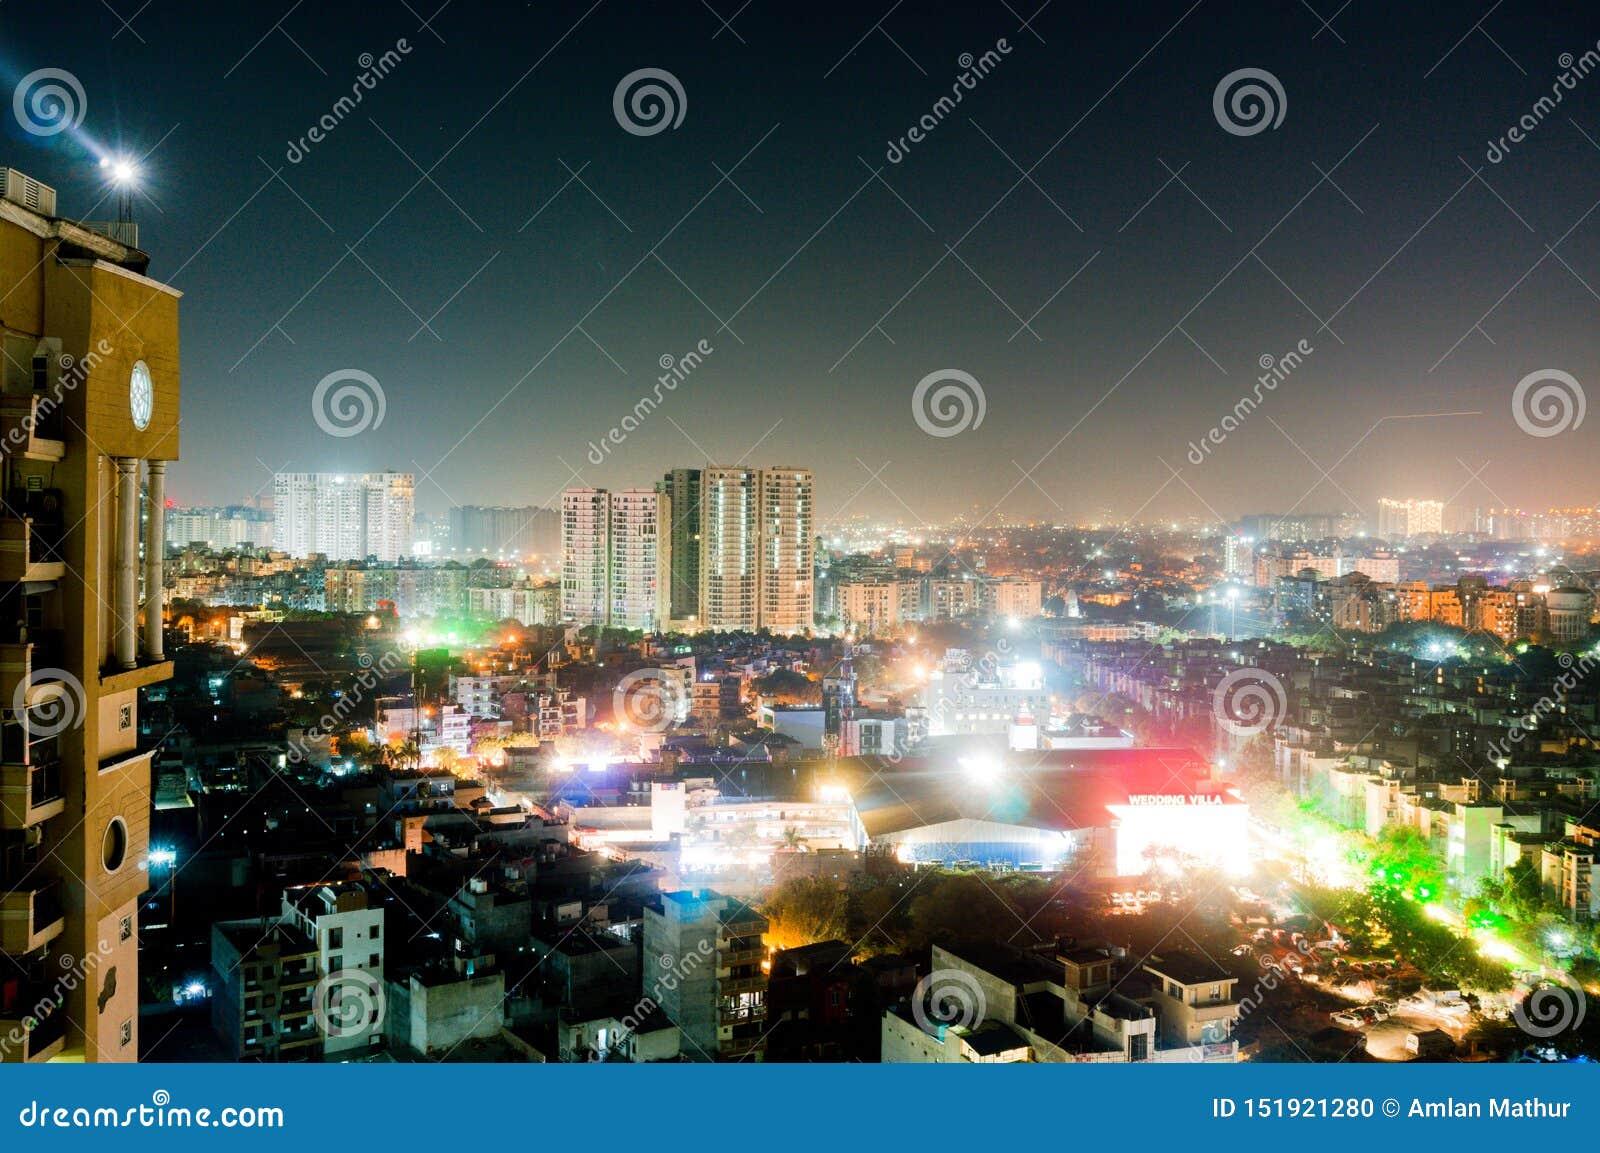 Aerial Cityscape Shot Of Noida, Delhi, Grugaon At Dusk